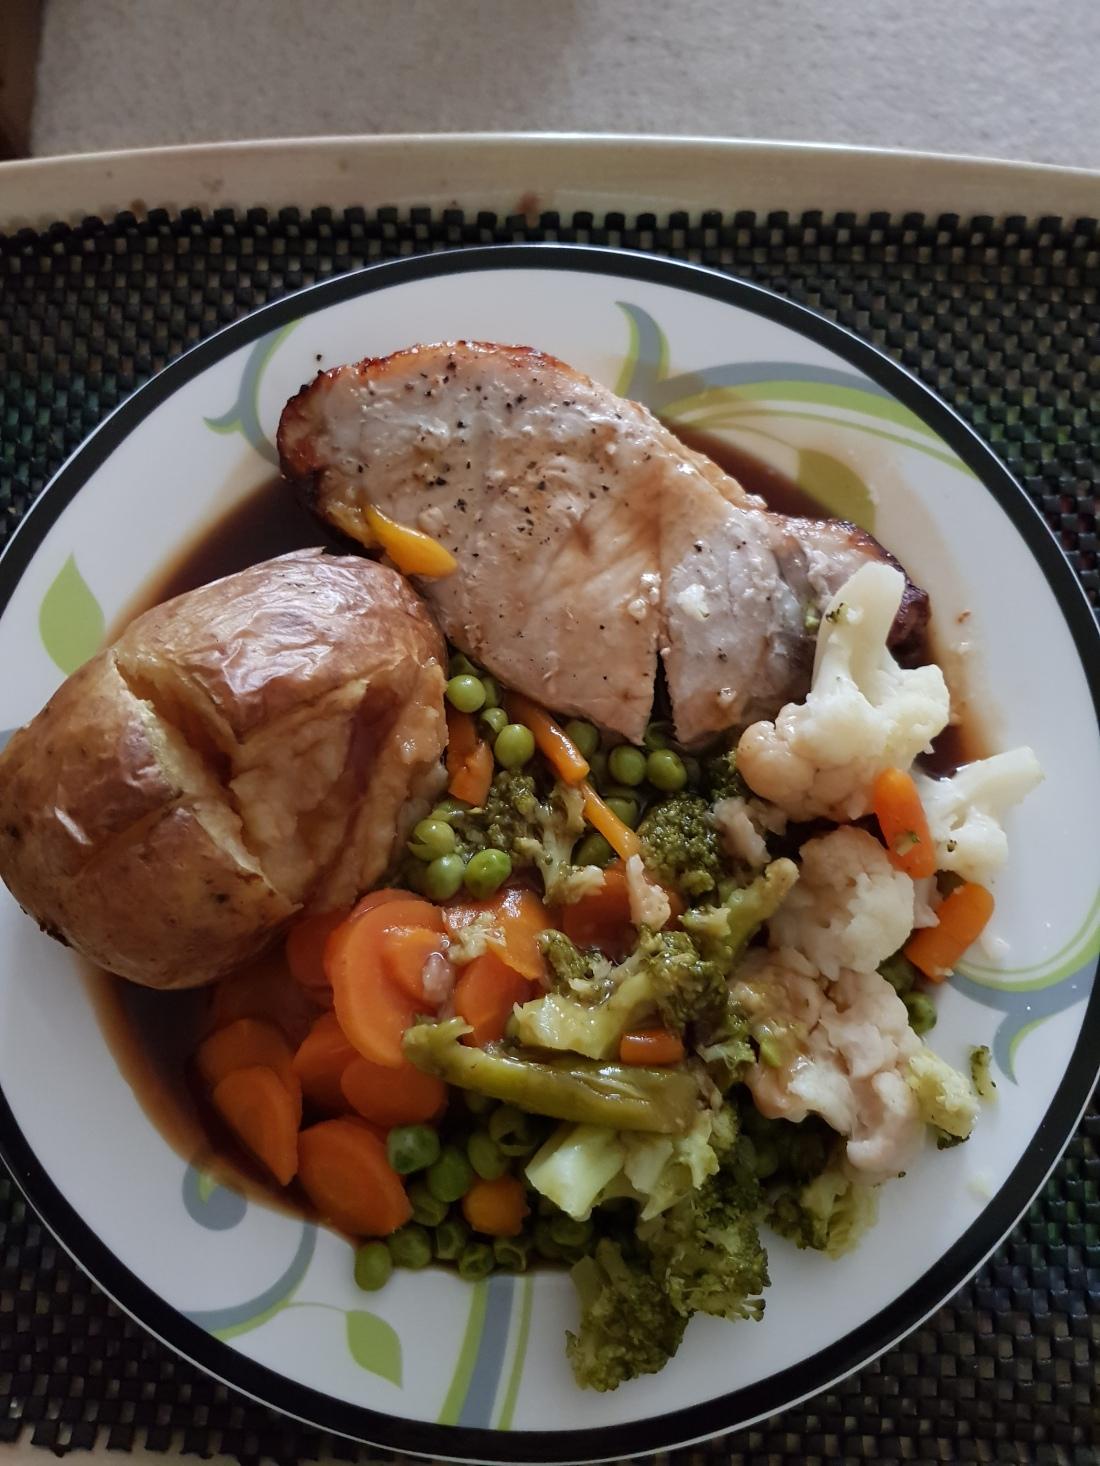 Main meal of pork medallion, jacket potato and vegetables